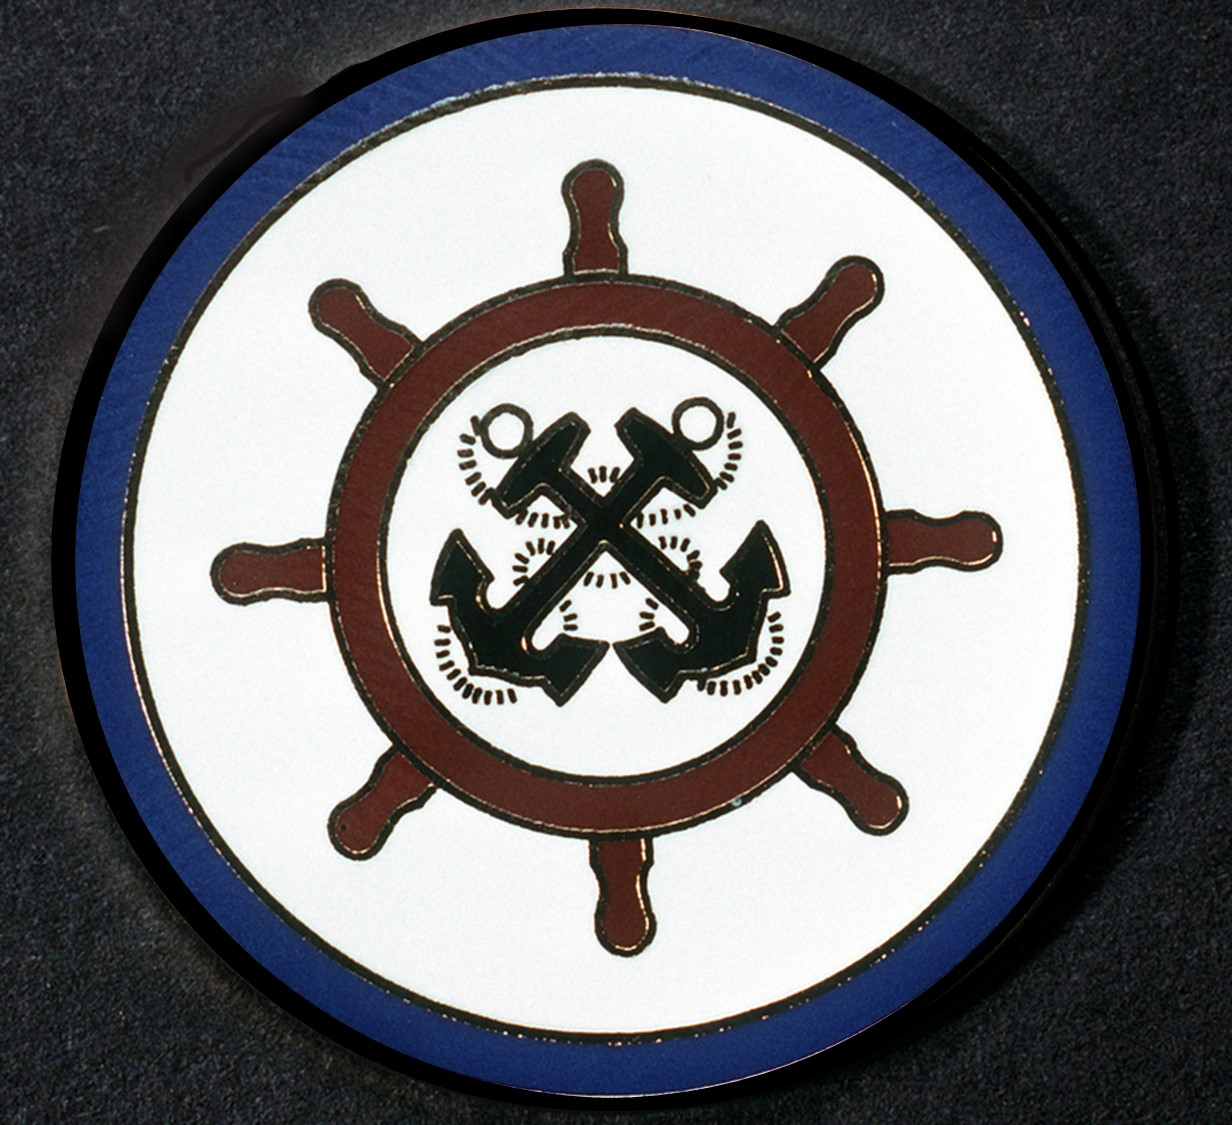 Craftmaster Insignia